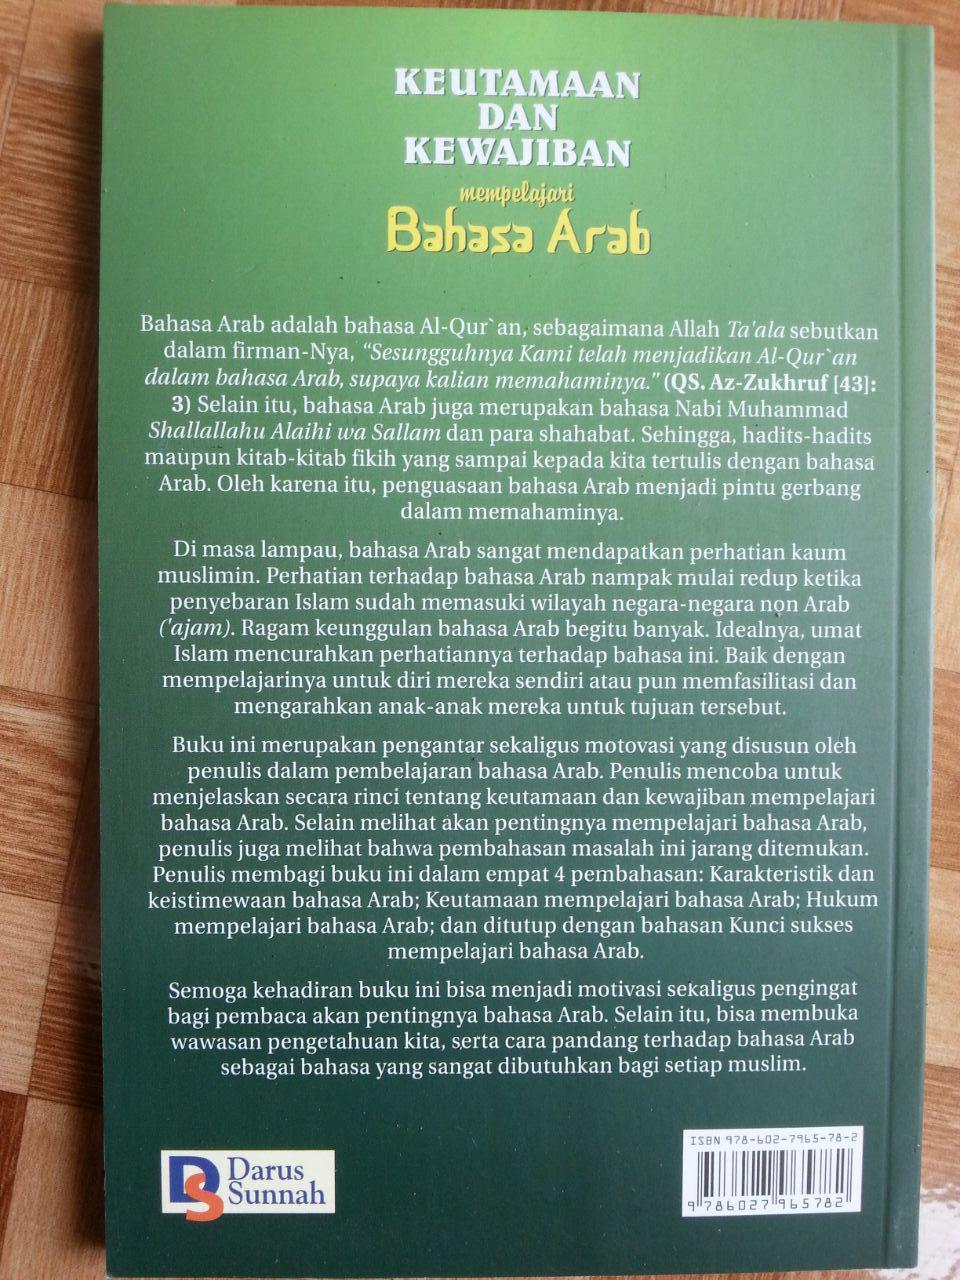 Buku Keutamaan dan Kewajiban Mempelajari Bahasa Arab cover